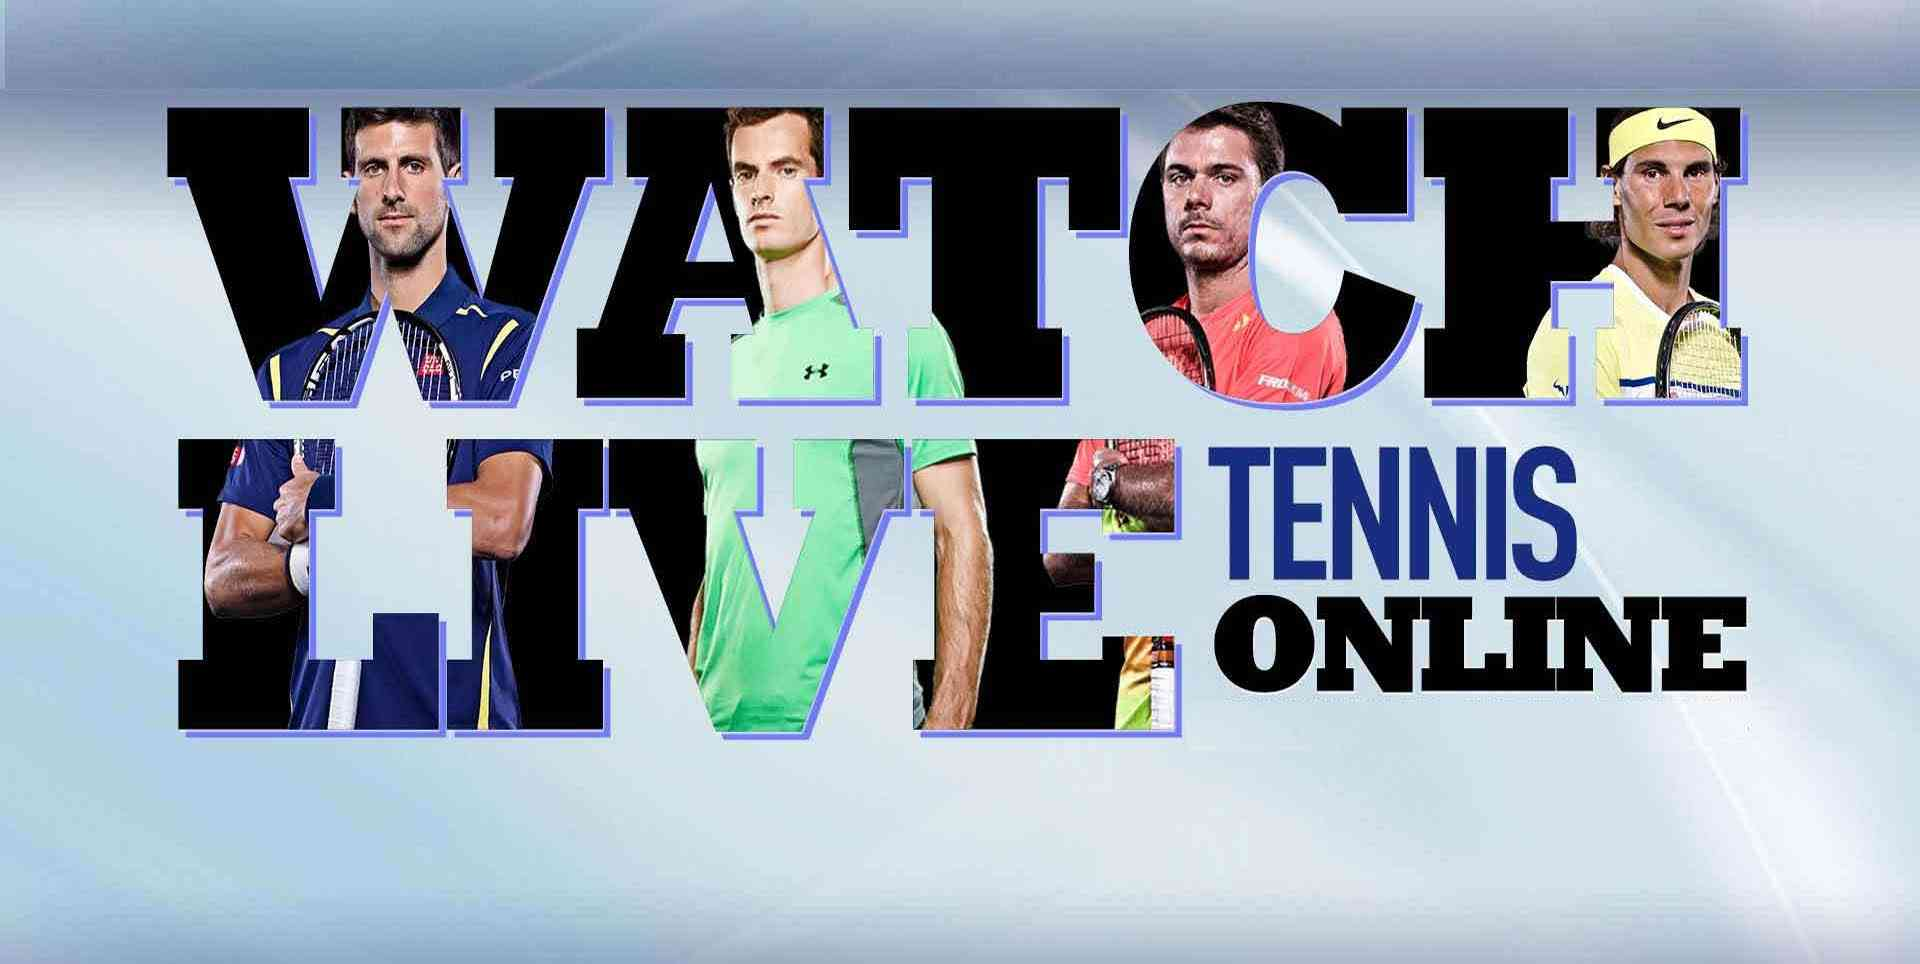 Watch Semi final N. Djokovic vs E. Gulbis stream live